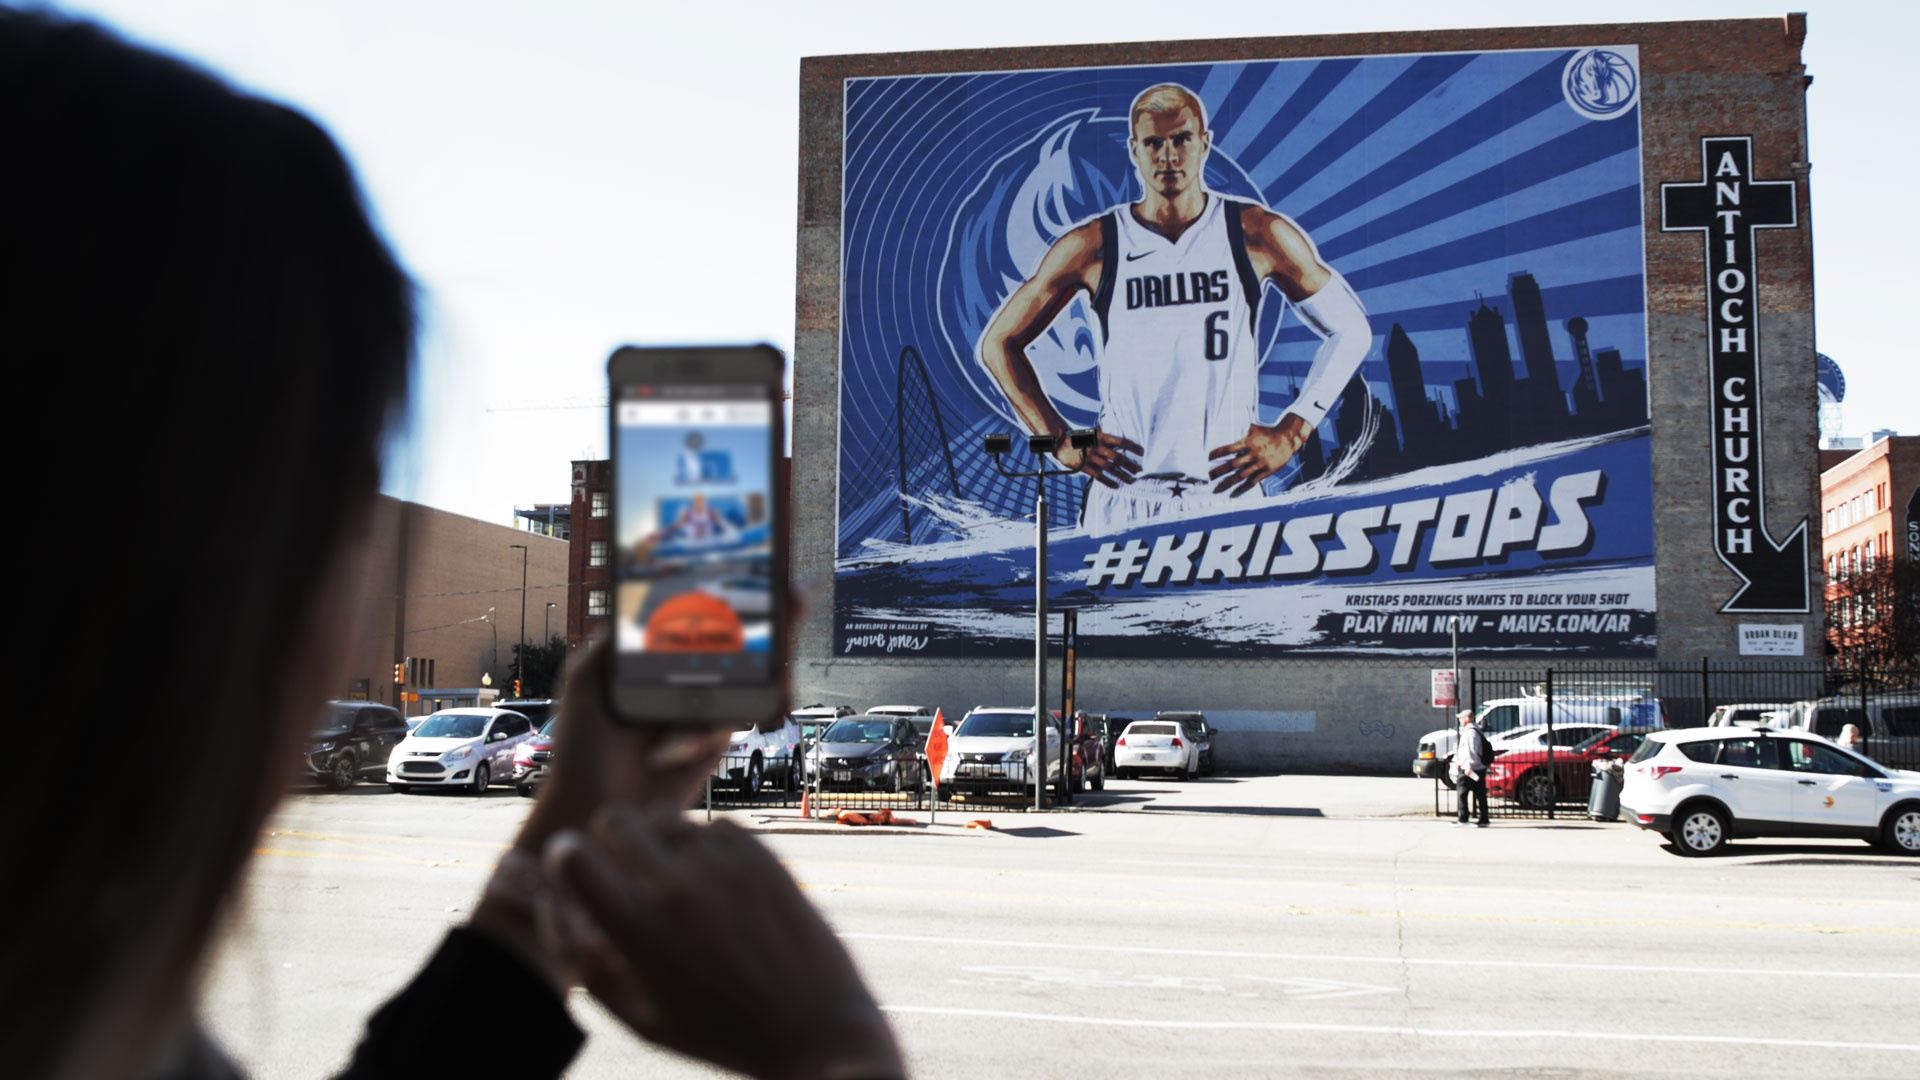 Thumbnail for Dallas Mavericks - #KRISSTOPS